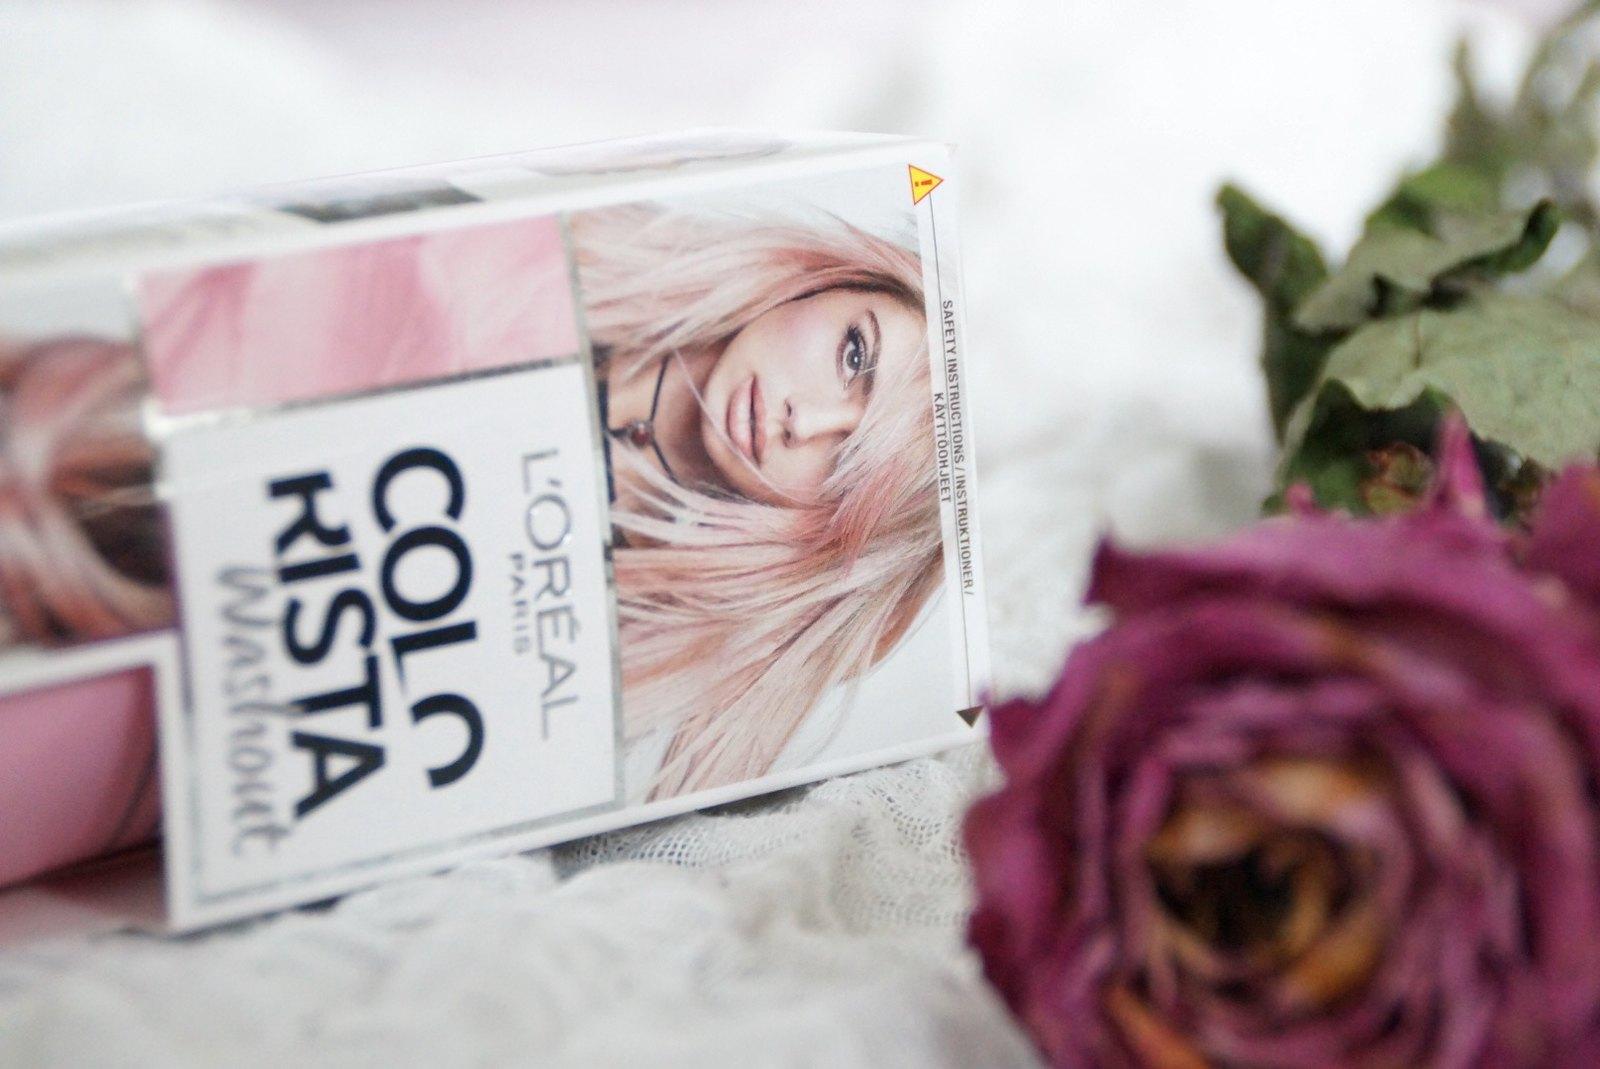 Pink dip dye hair – L'Oréal Colorista washout